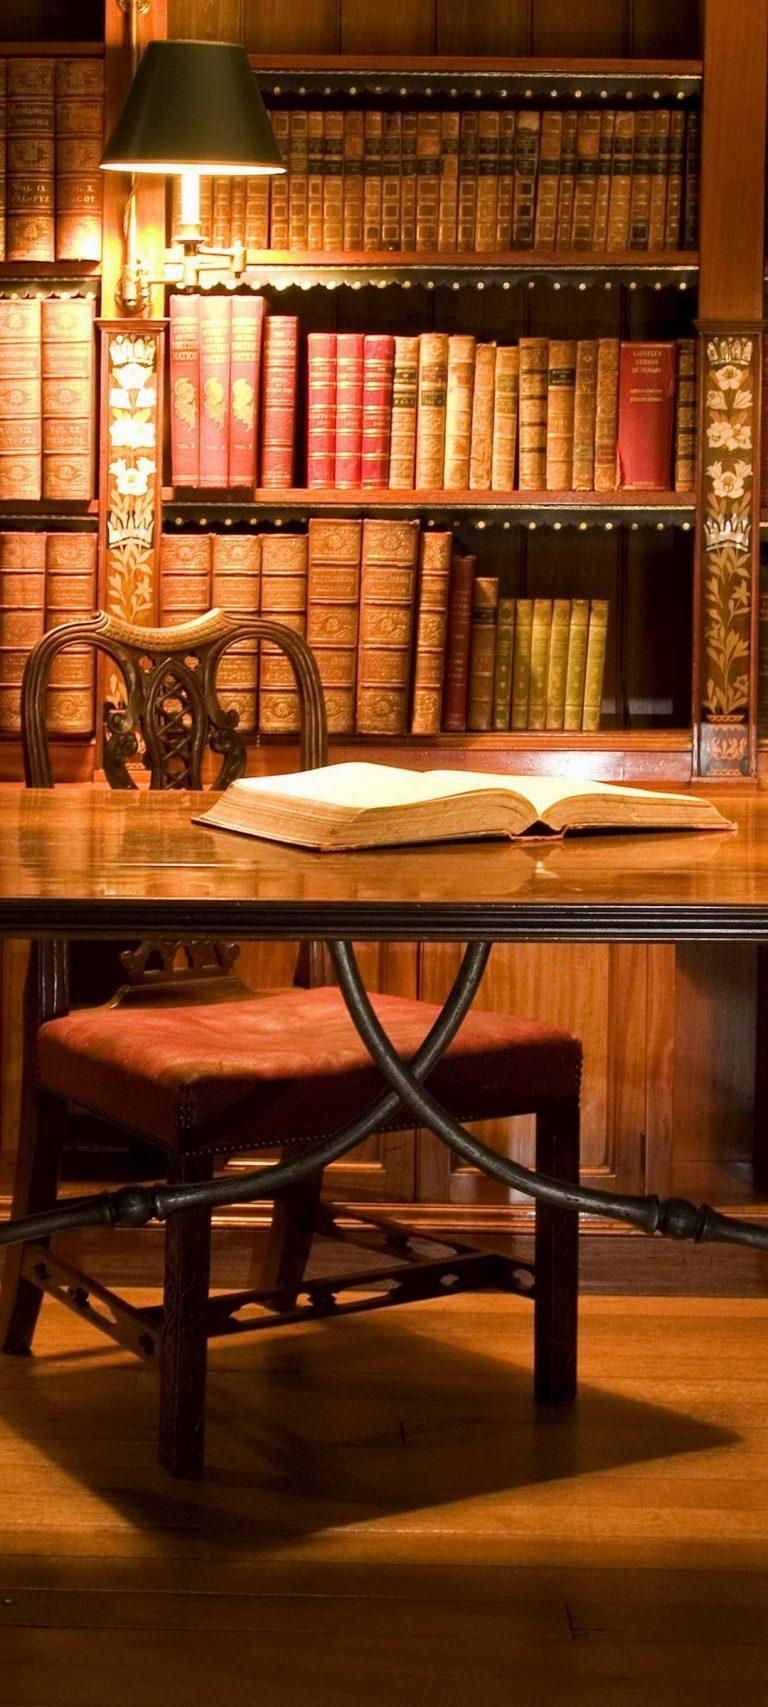 Cabinet Table Book Globe 1080x2400 768x1707